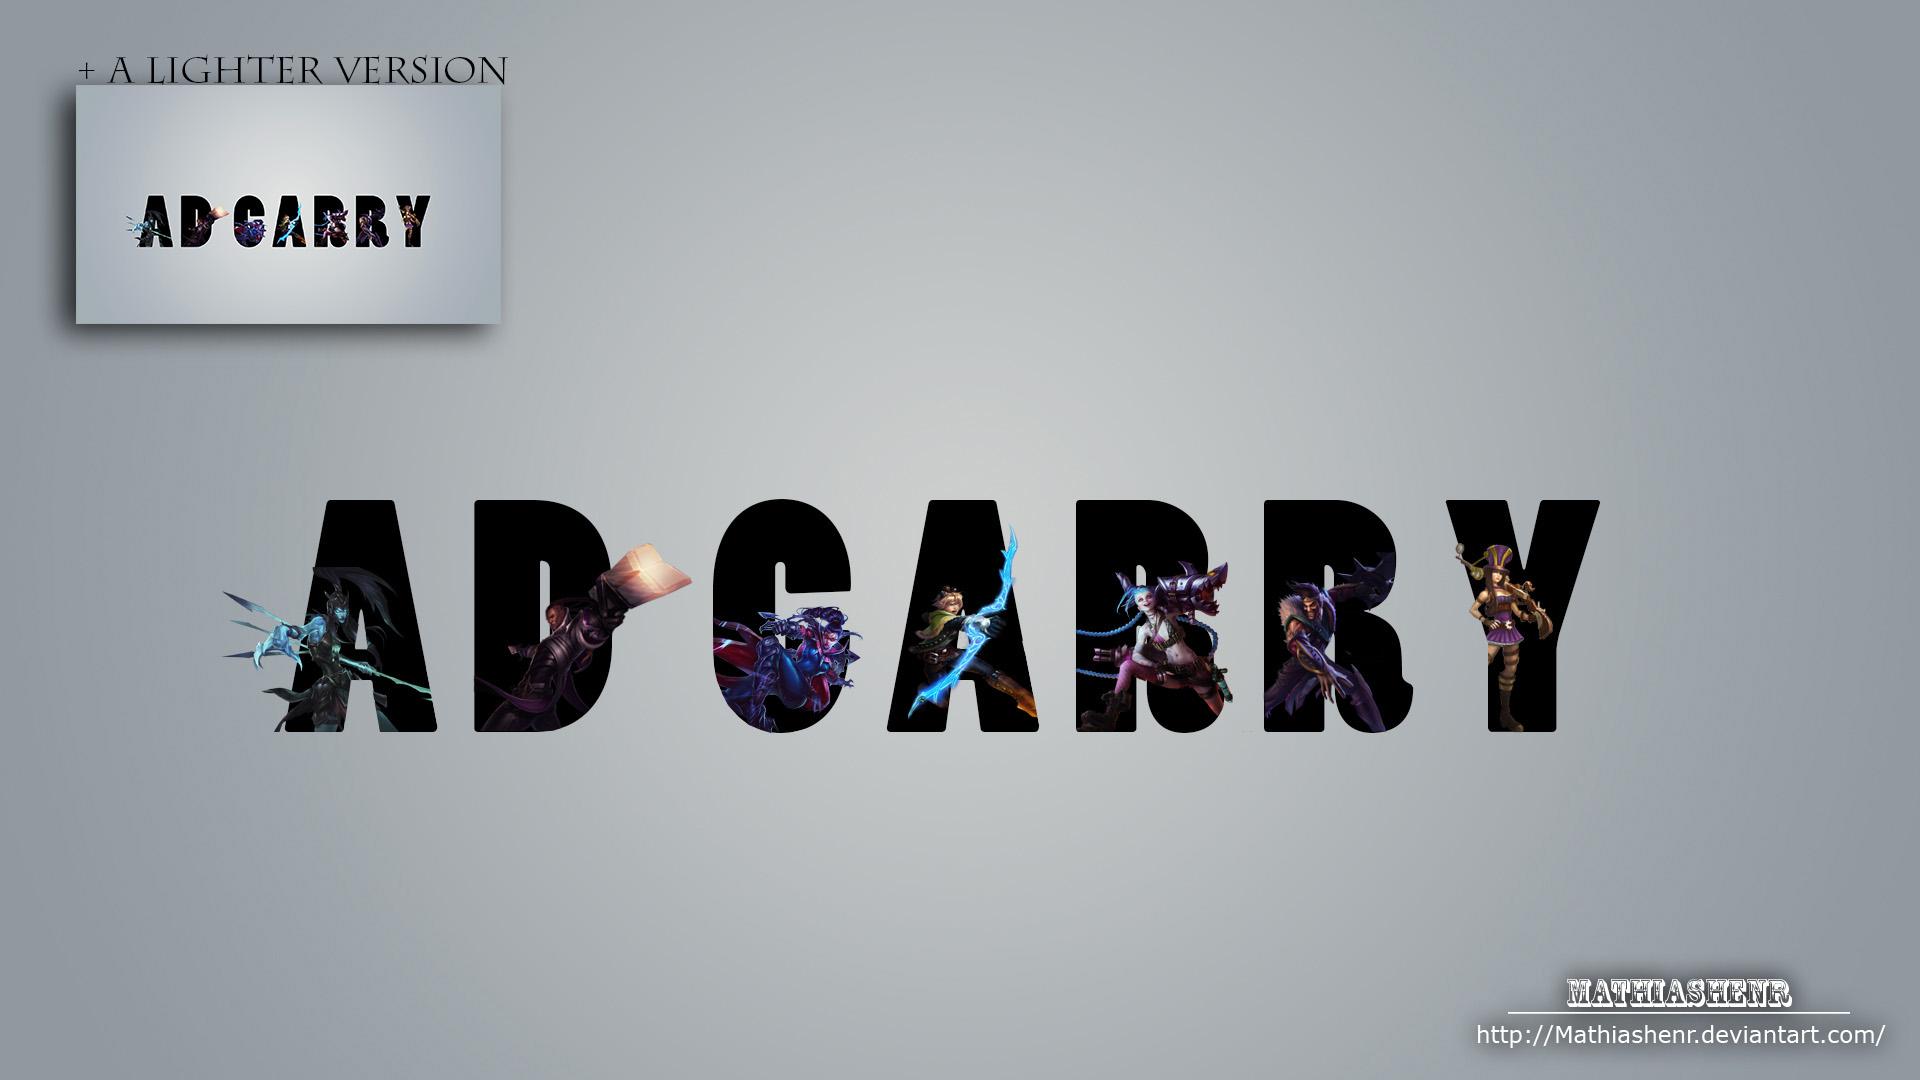 League of Legends AD CARRY WALLPAPER by Mathiashenr on ...